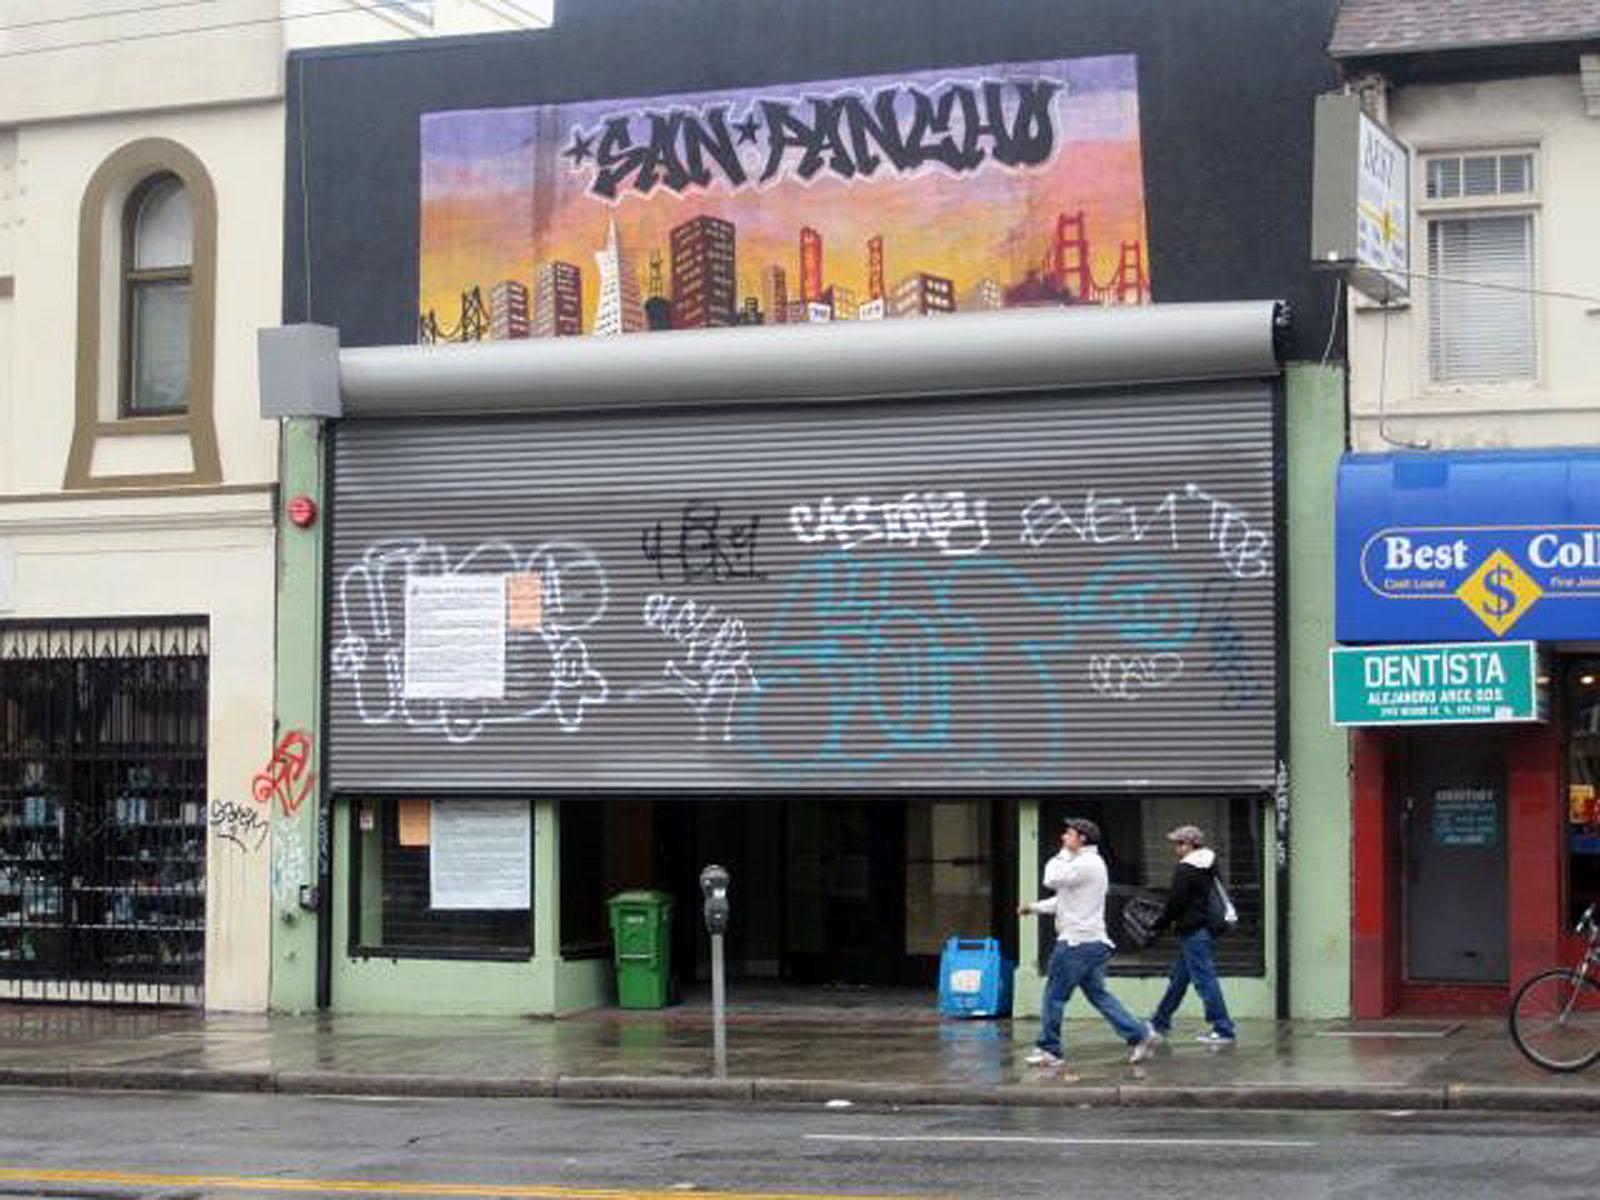 The Kinguvdastreet.com Urban Clothing Store